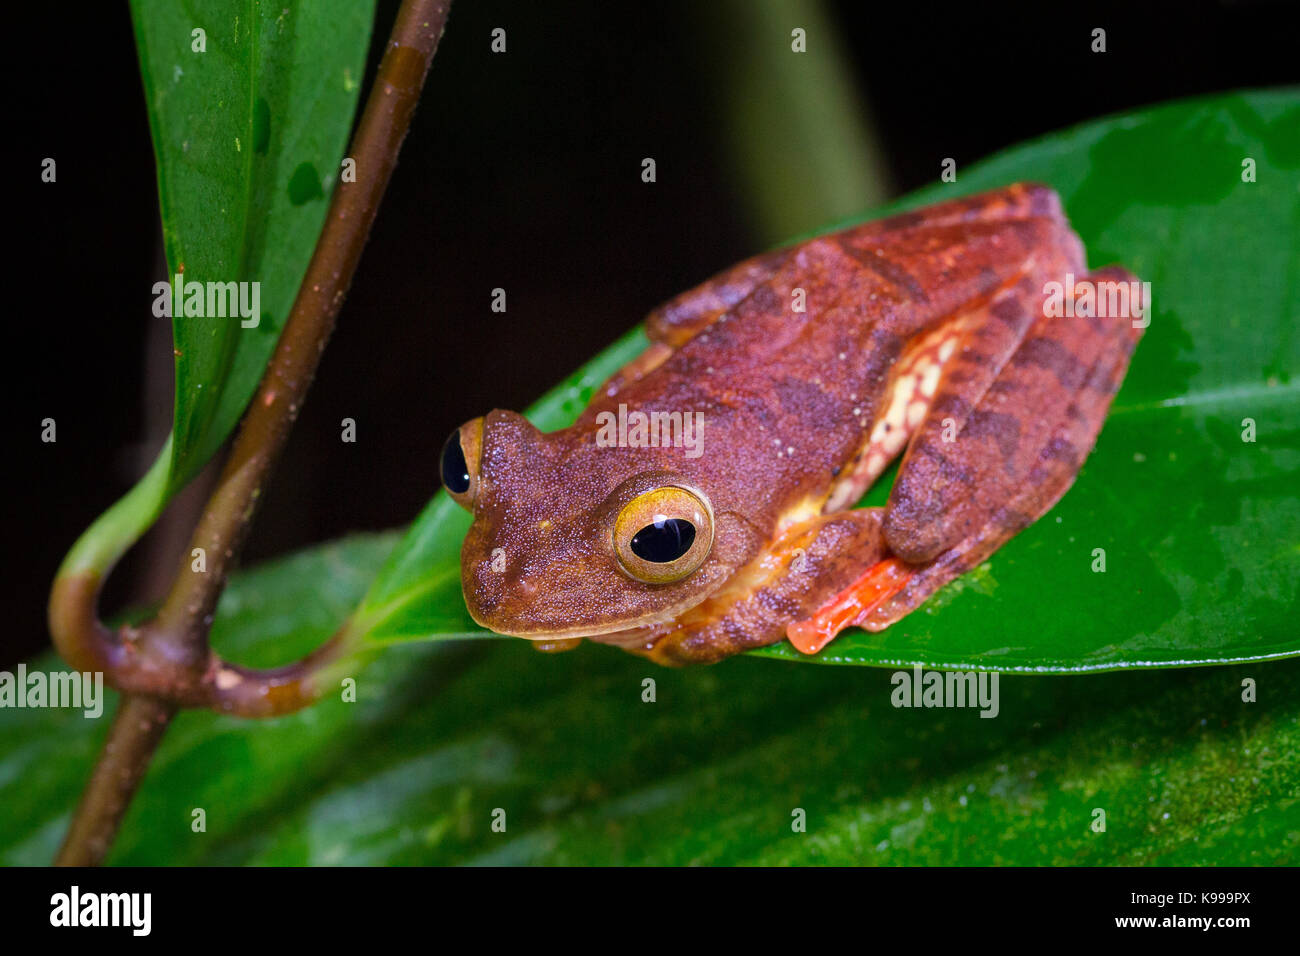 Harlequin Tree Frog (Rhacophorus pardalis), Kubah National Park, Sarawak, Malaysia - Stock Image